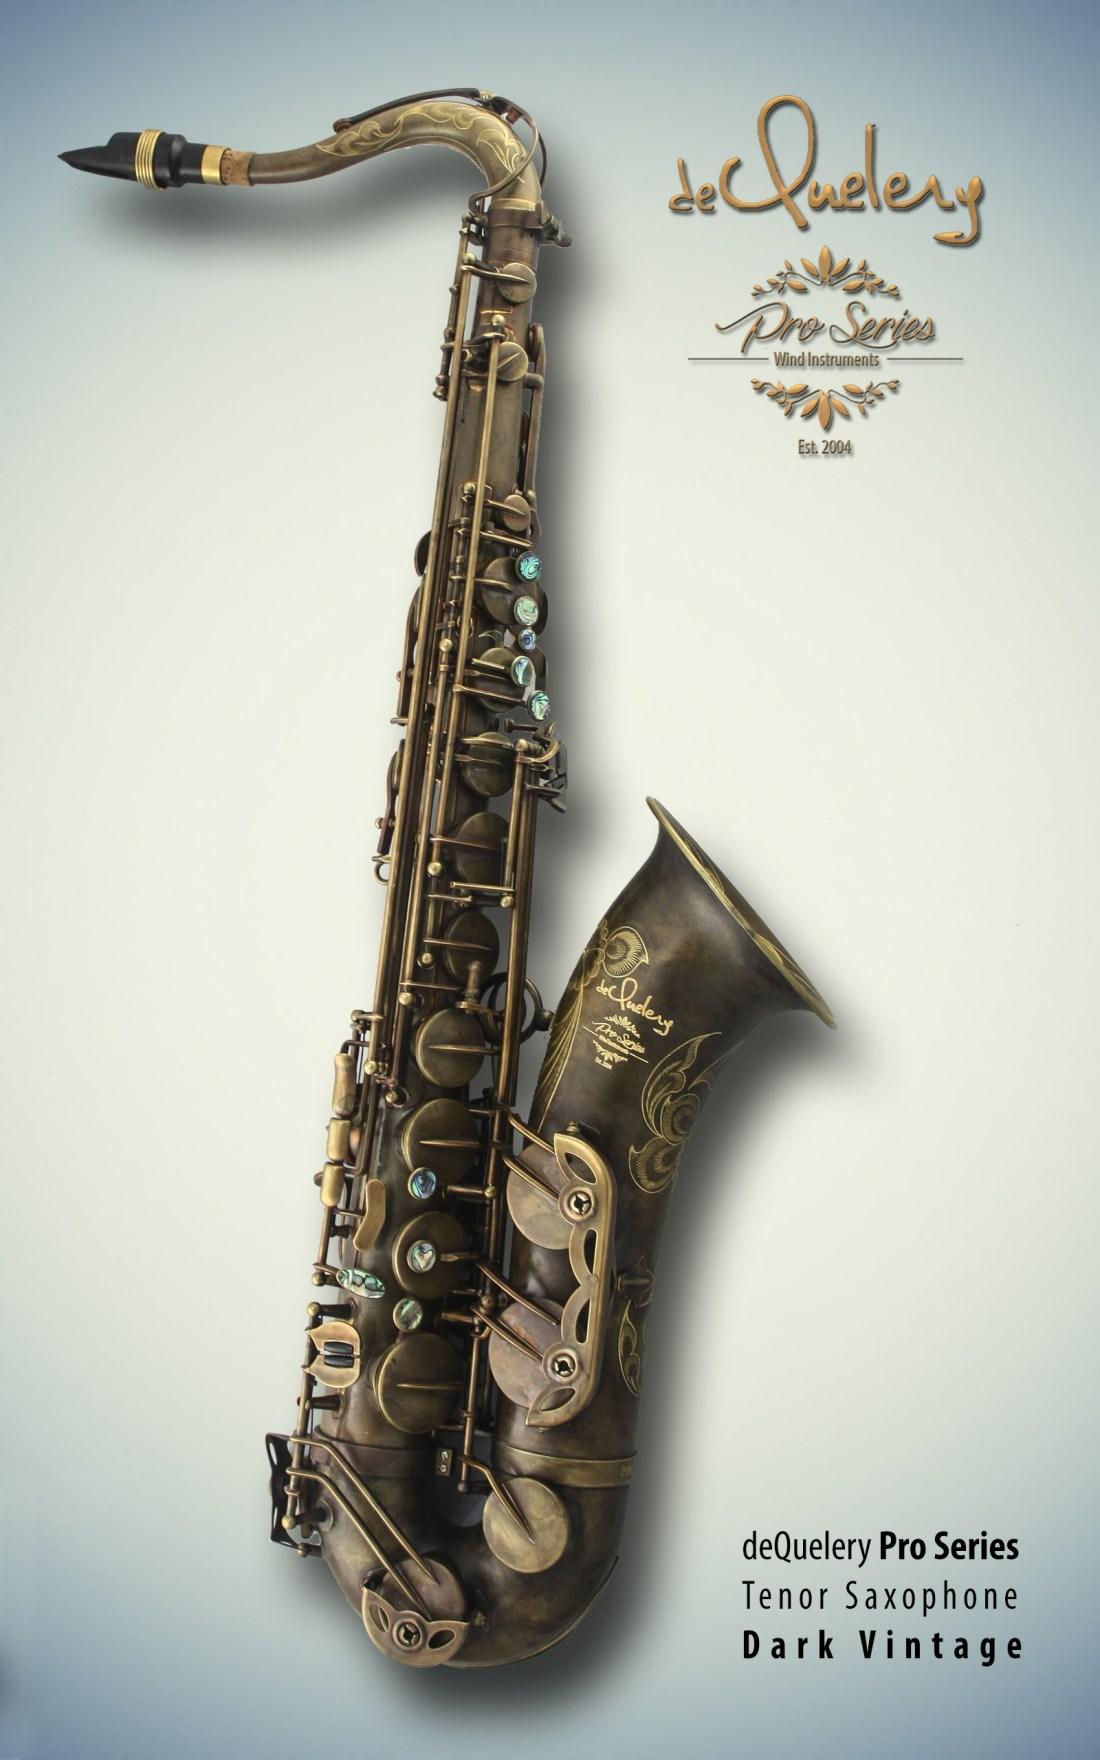 dequelery pro tenor dark vintage